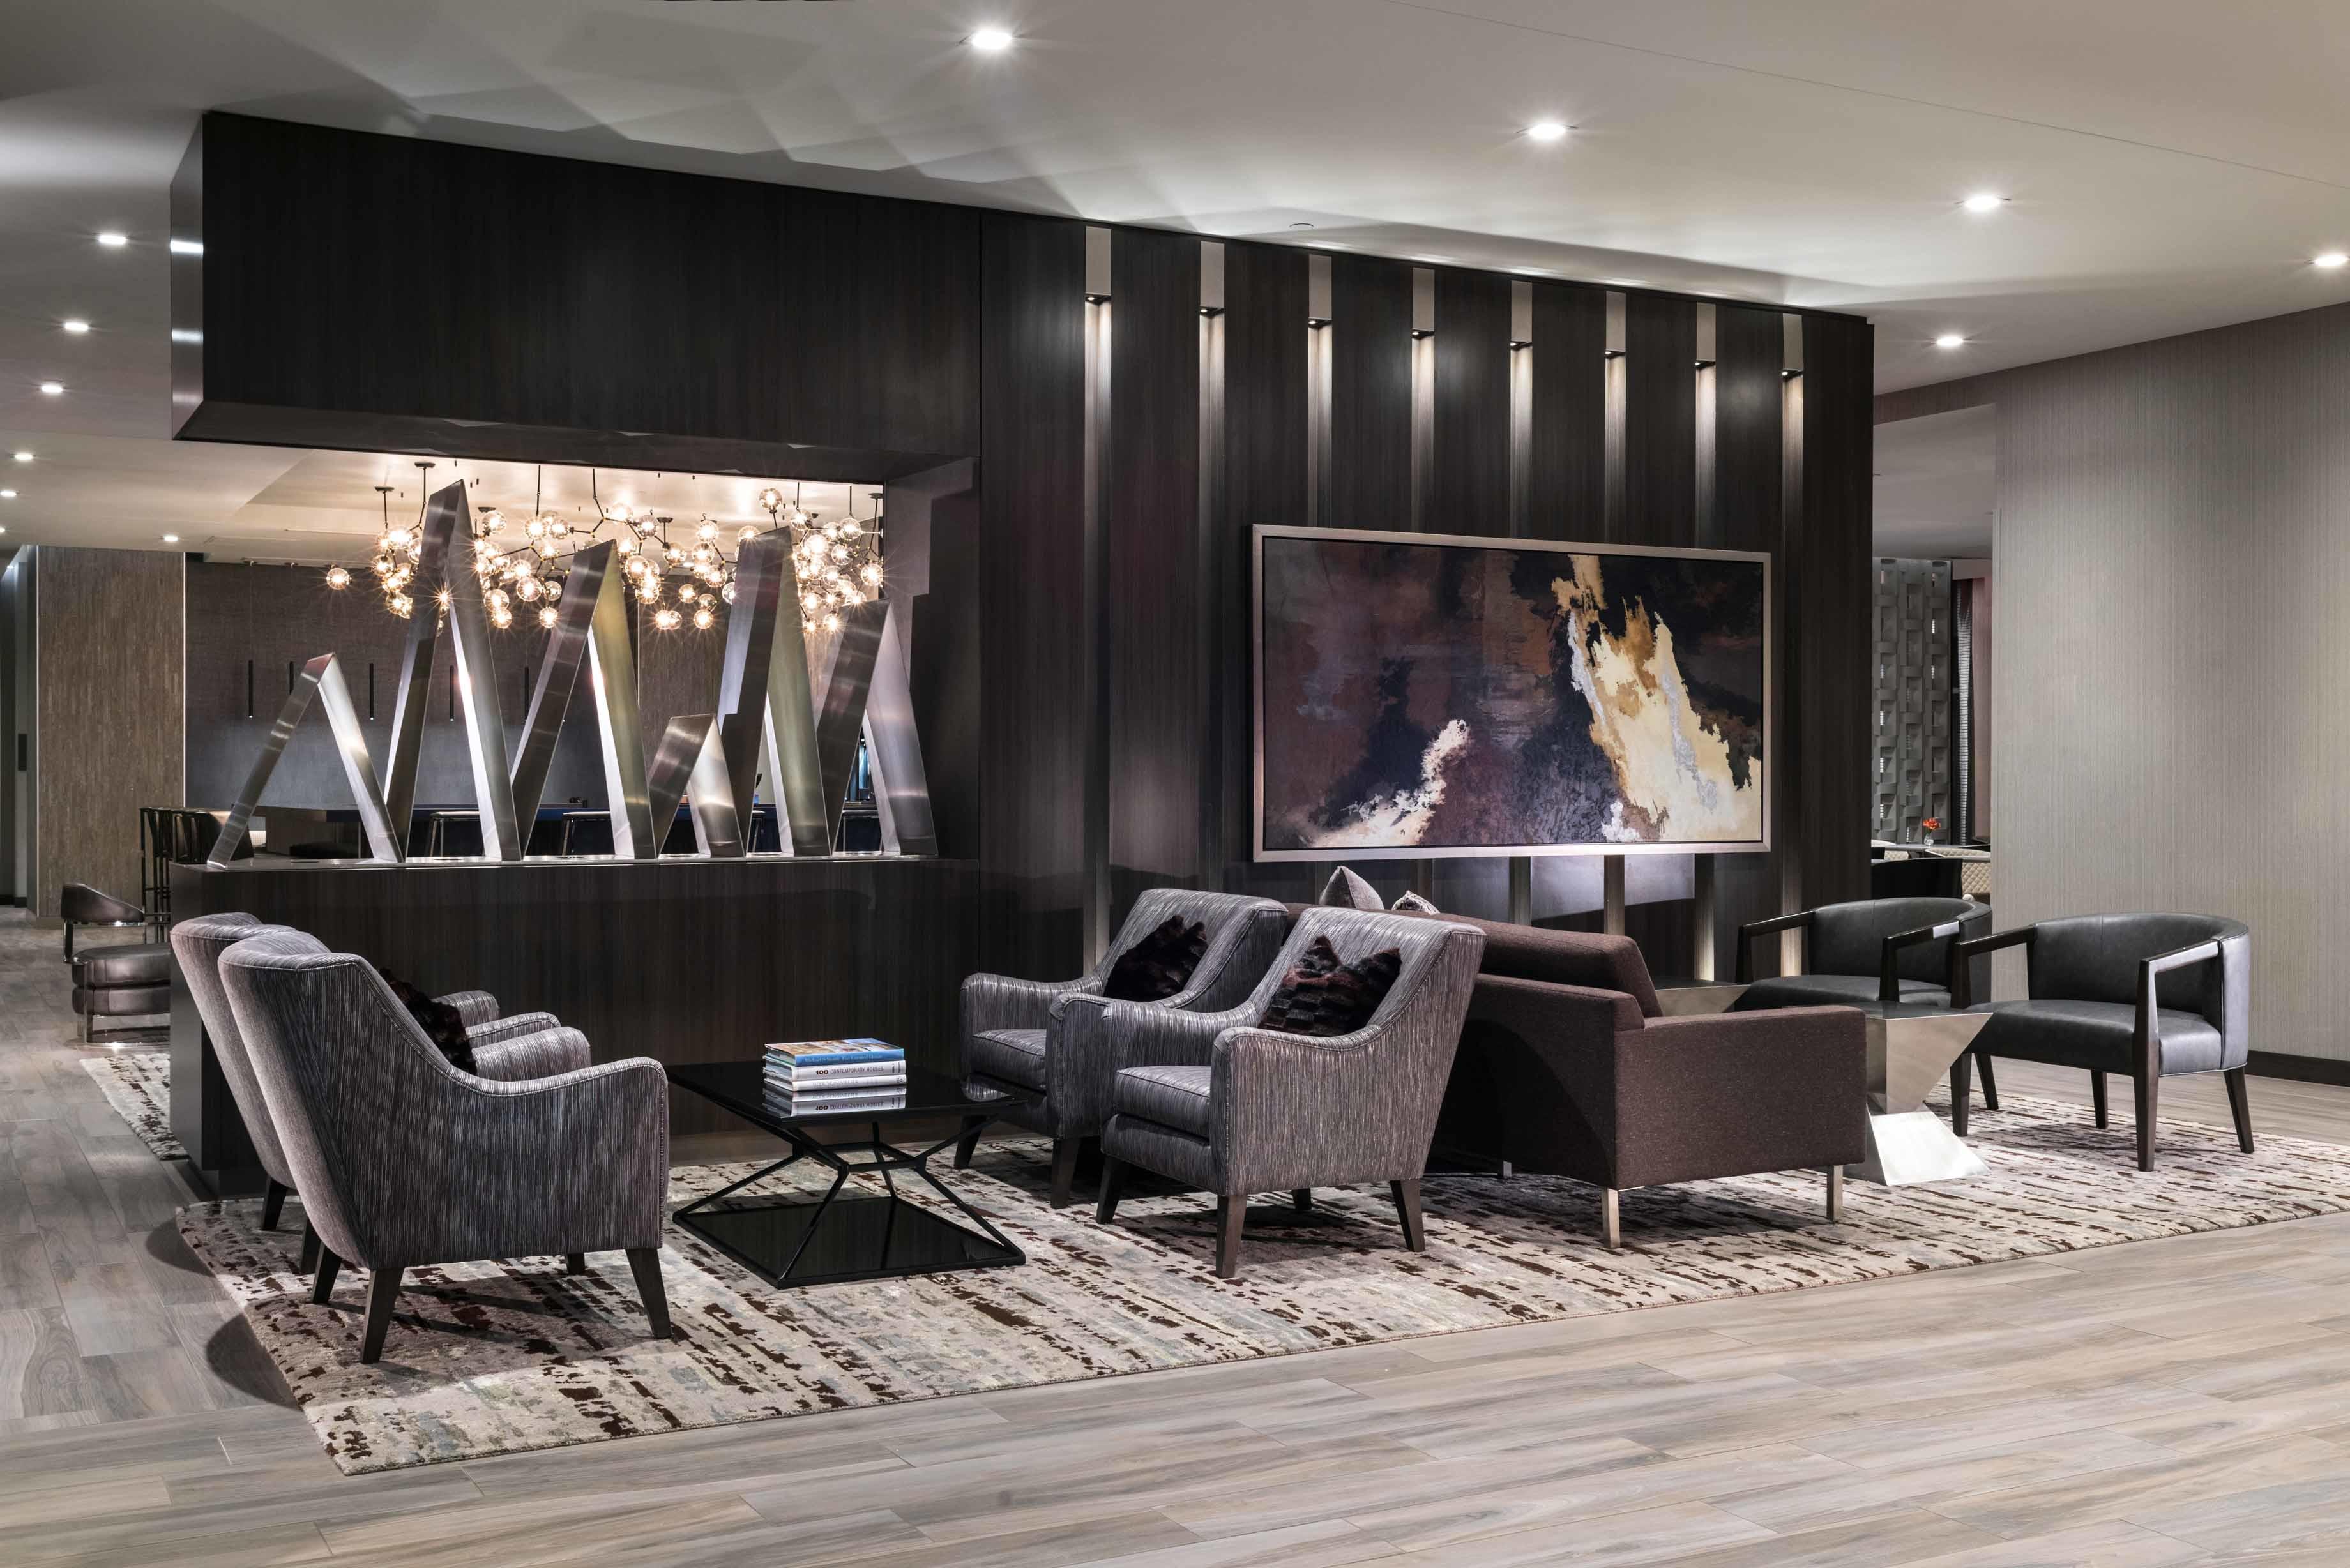 AC Hotel by Marriott Boston Cambridge image 1